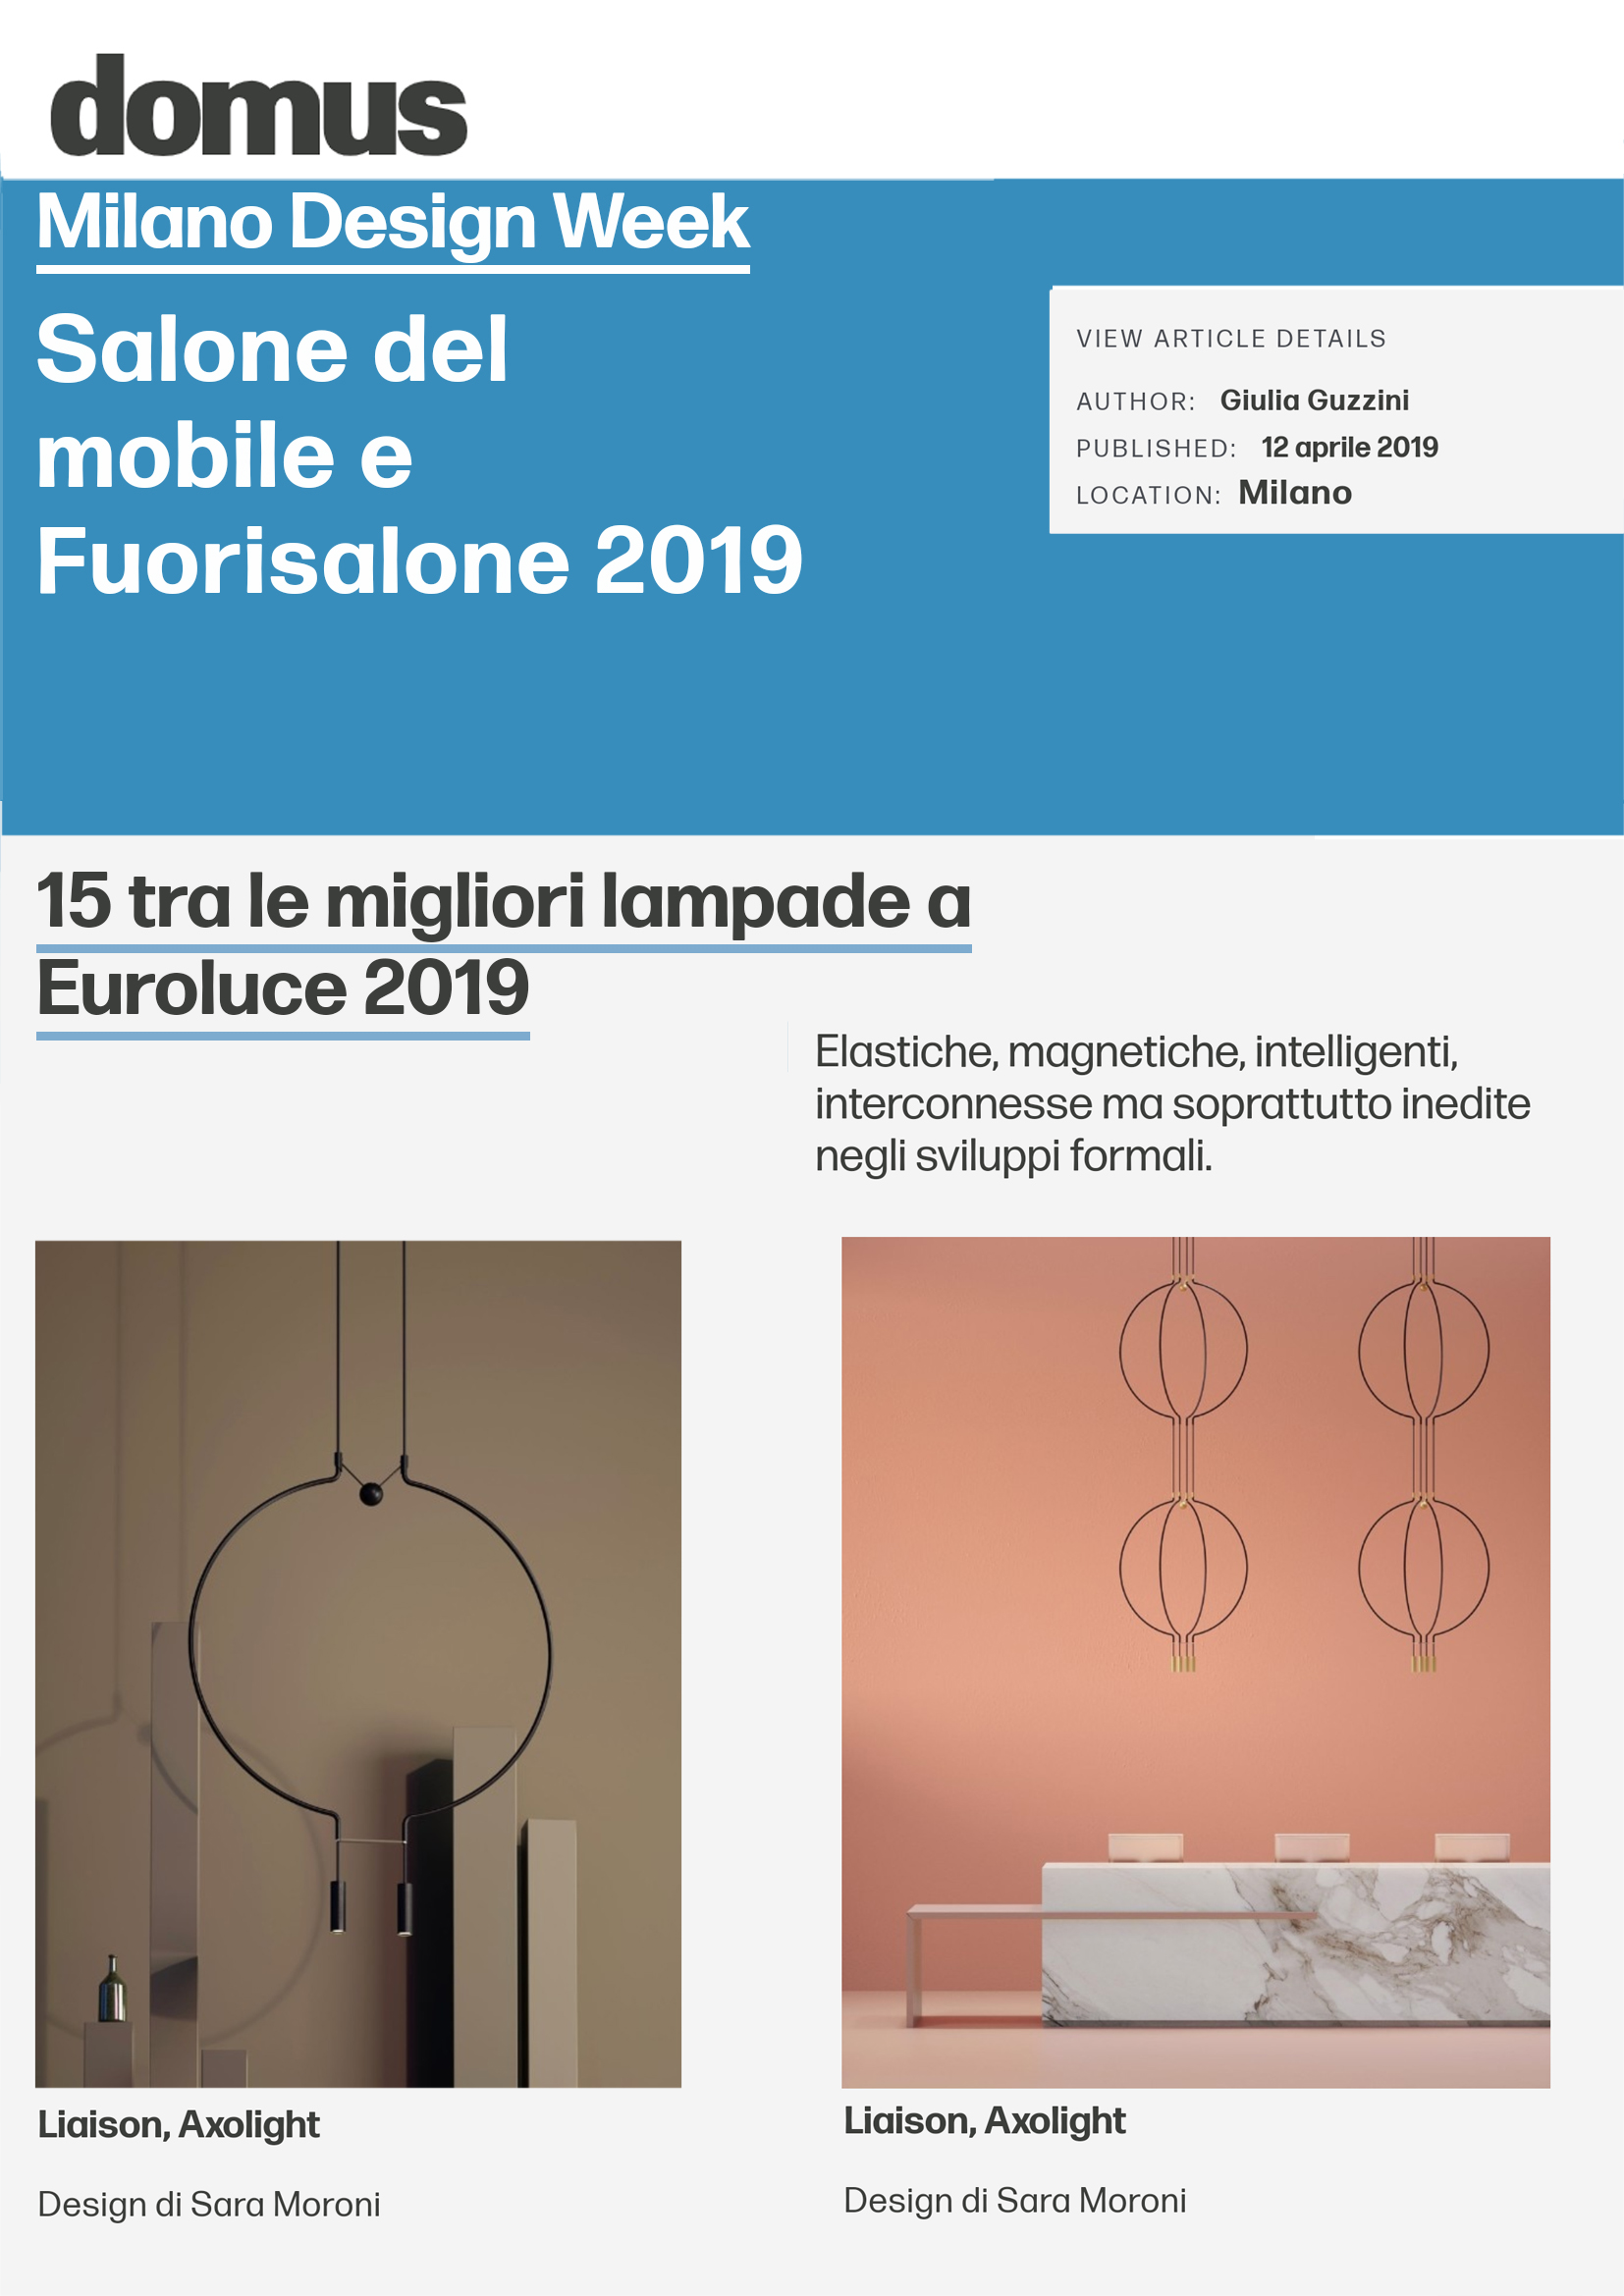 Domus web_Milano design week: 15 tra le migliori lampade ad Euroluce